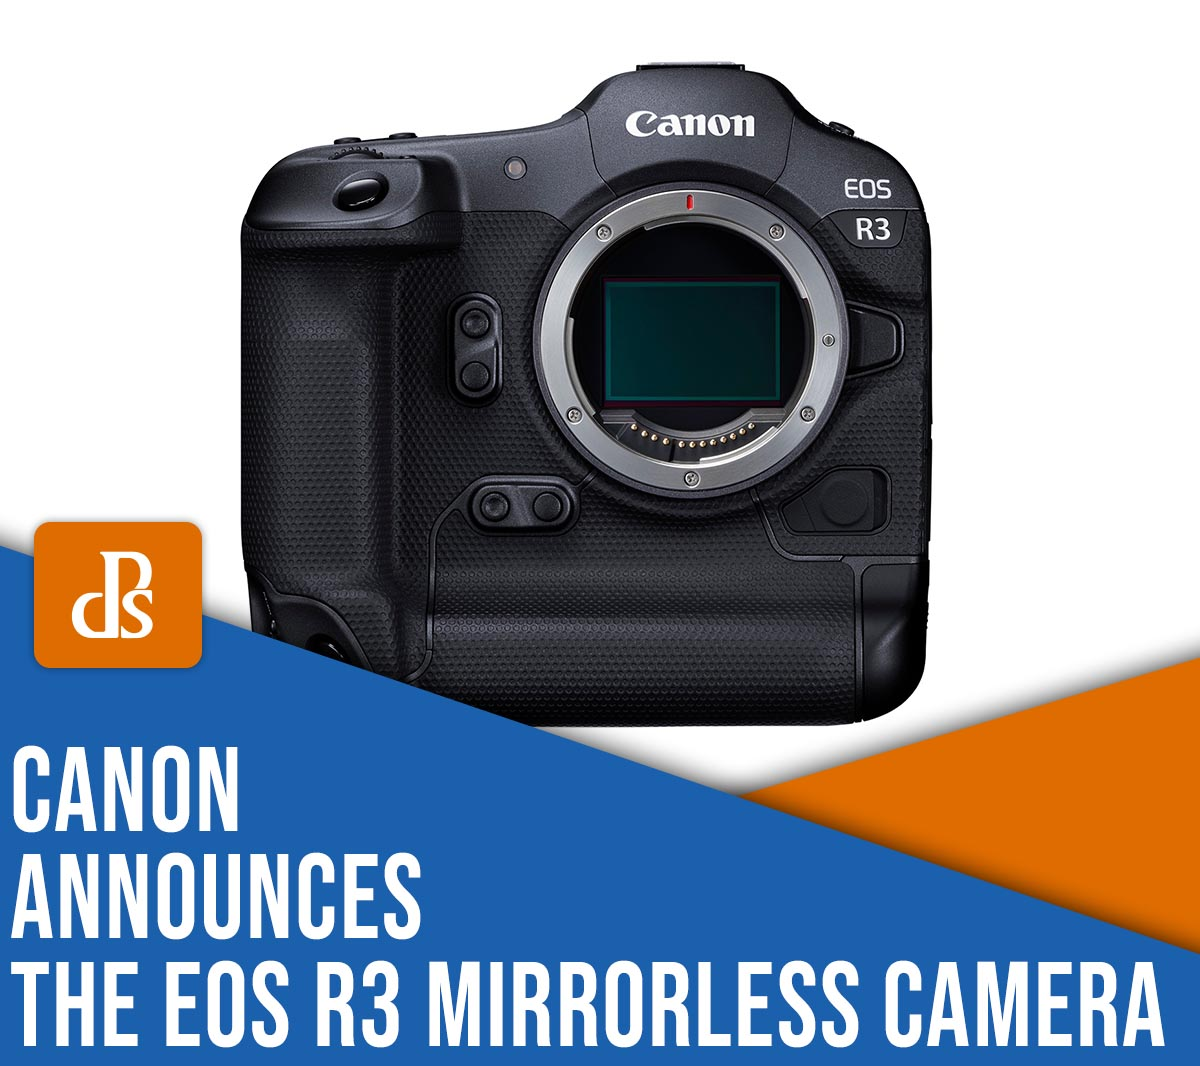 Canon announces the EOS R3 mirrorless camera